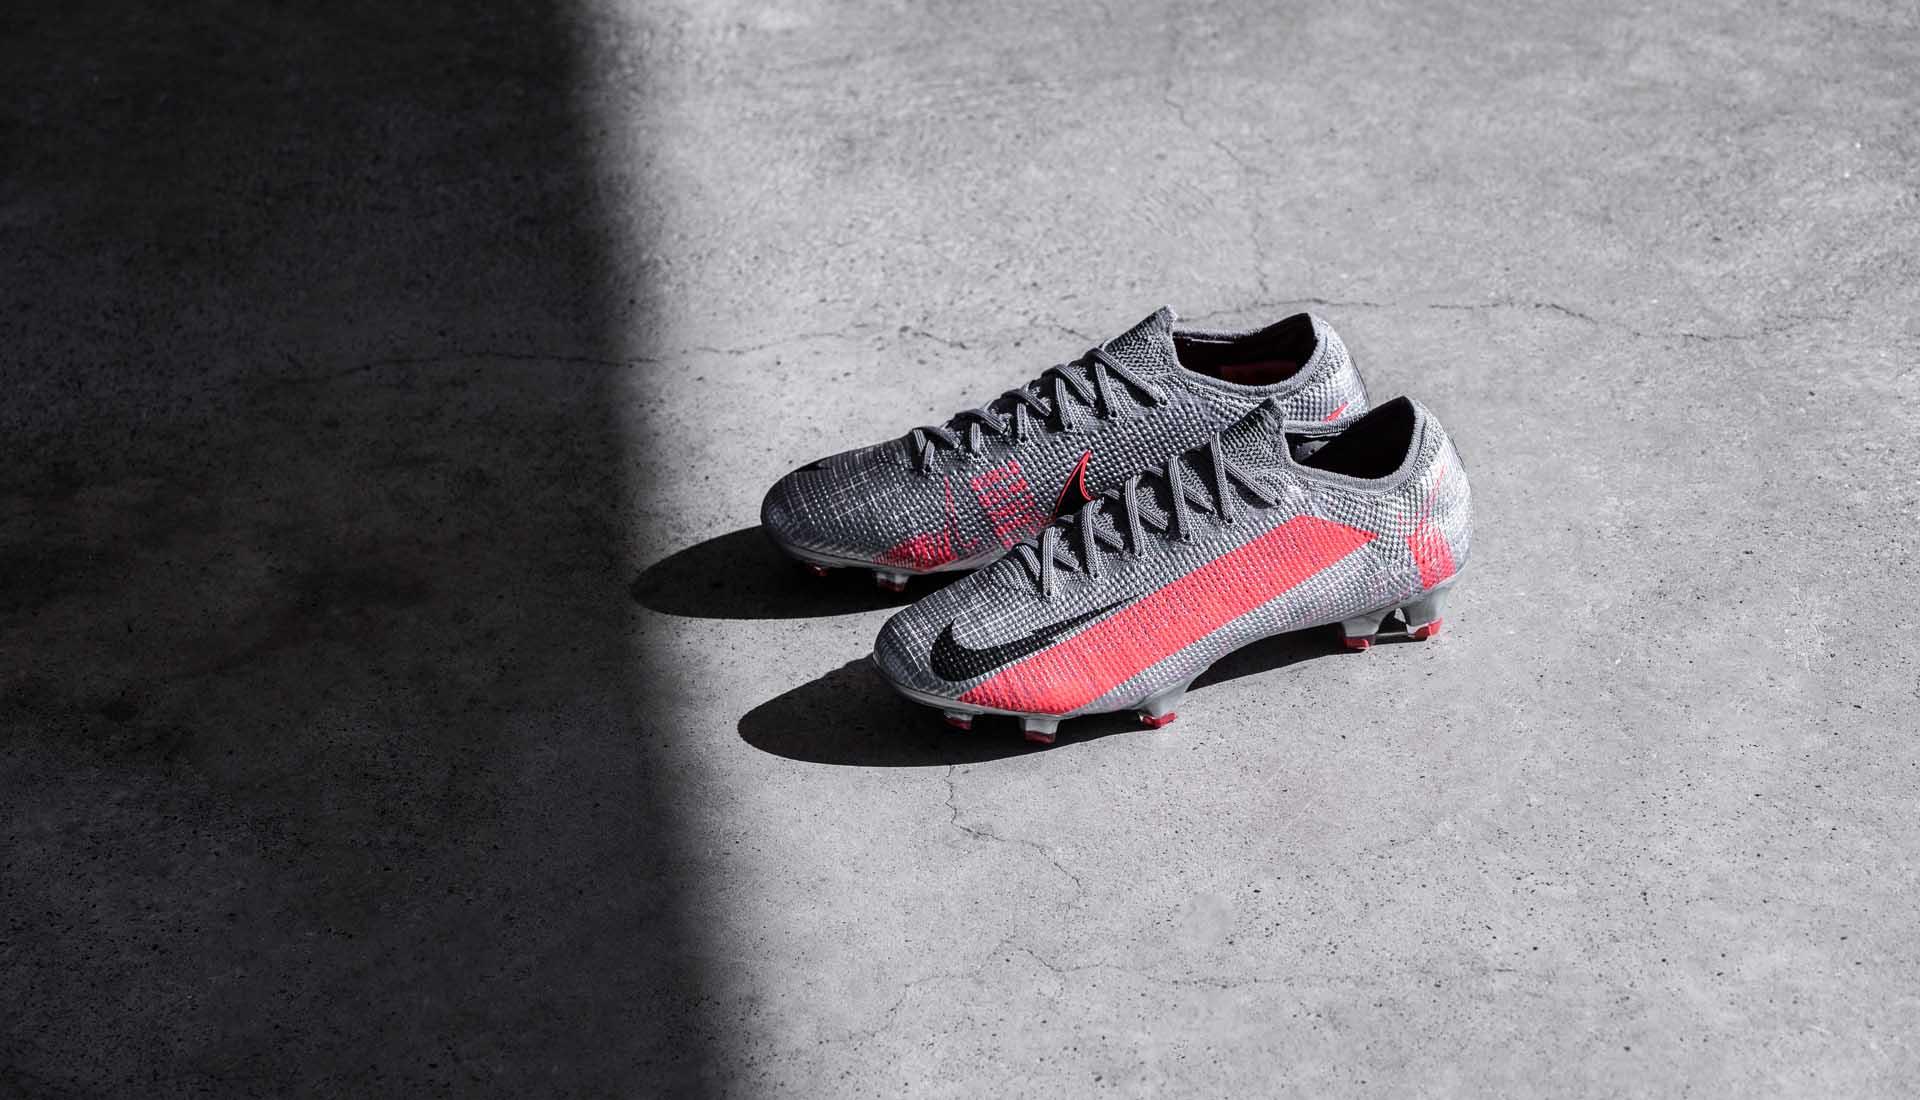 Giày đá bóng Nike Mercurial Neighbourhood Pack